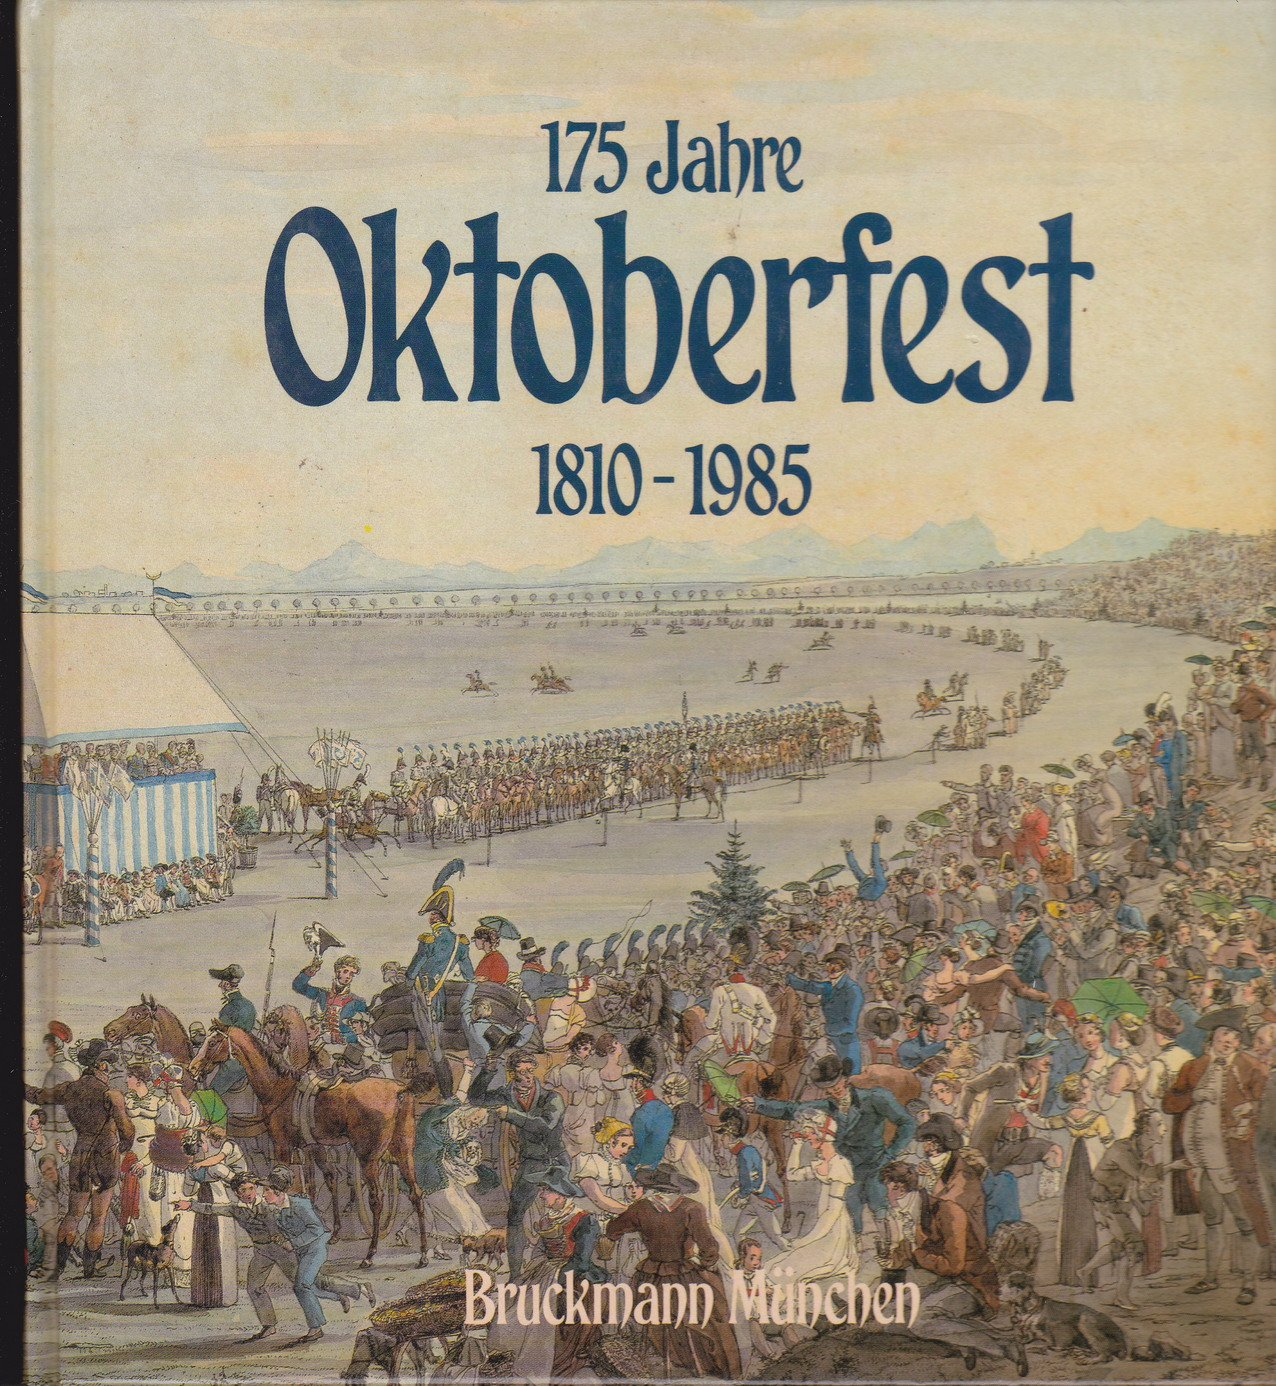 175 Jahre Oktoberfest 1810-1985